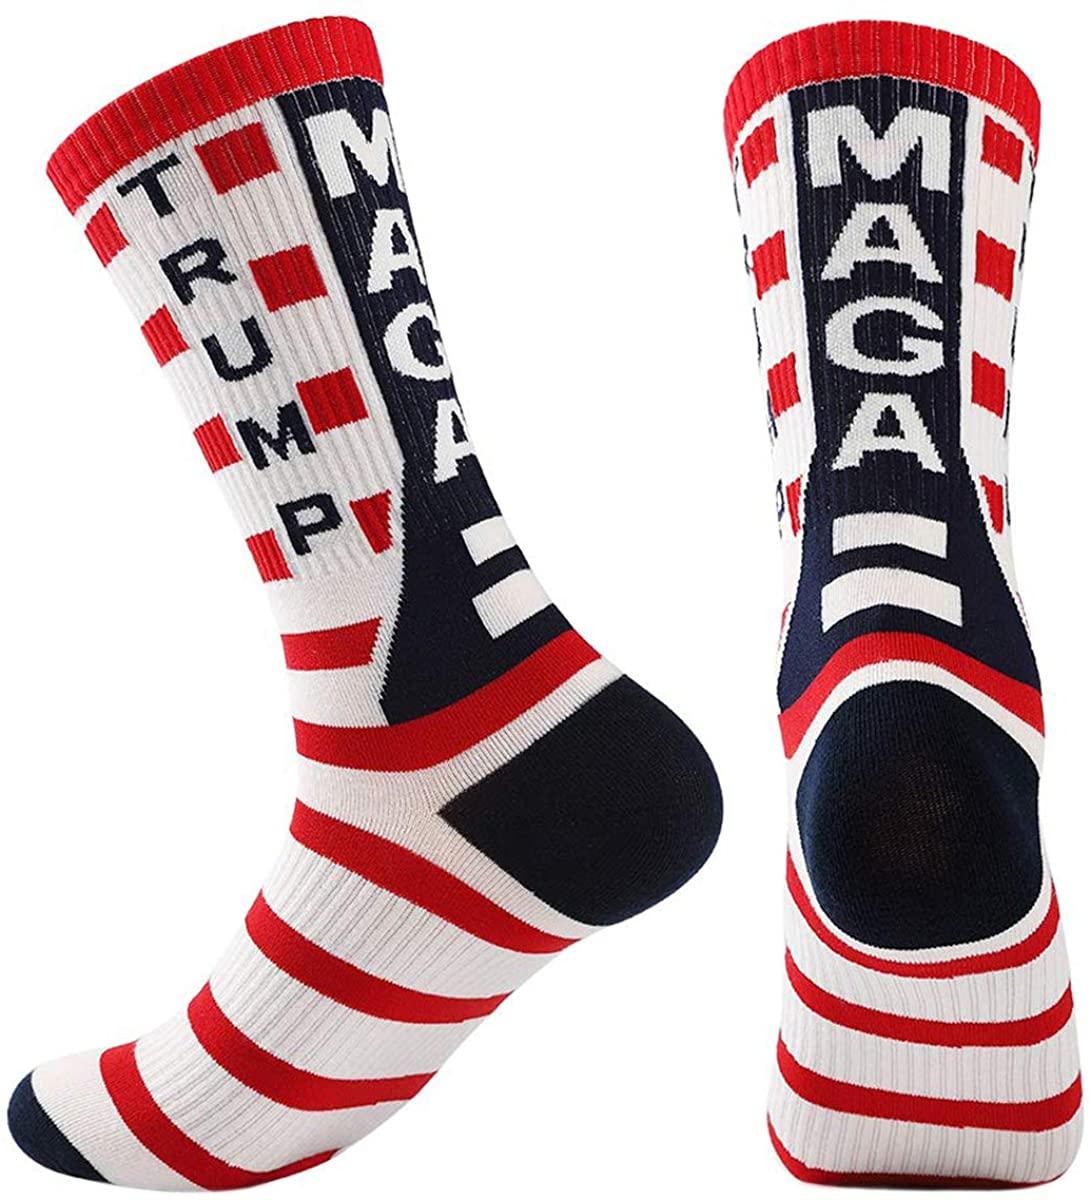 Trump Socks Unisex Novelty Crew Socks Make America Great Again 2020 Trump MAGA Socks